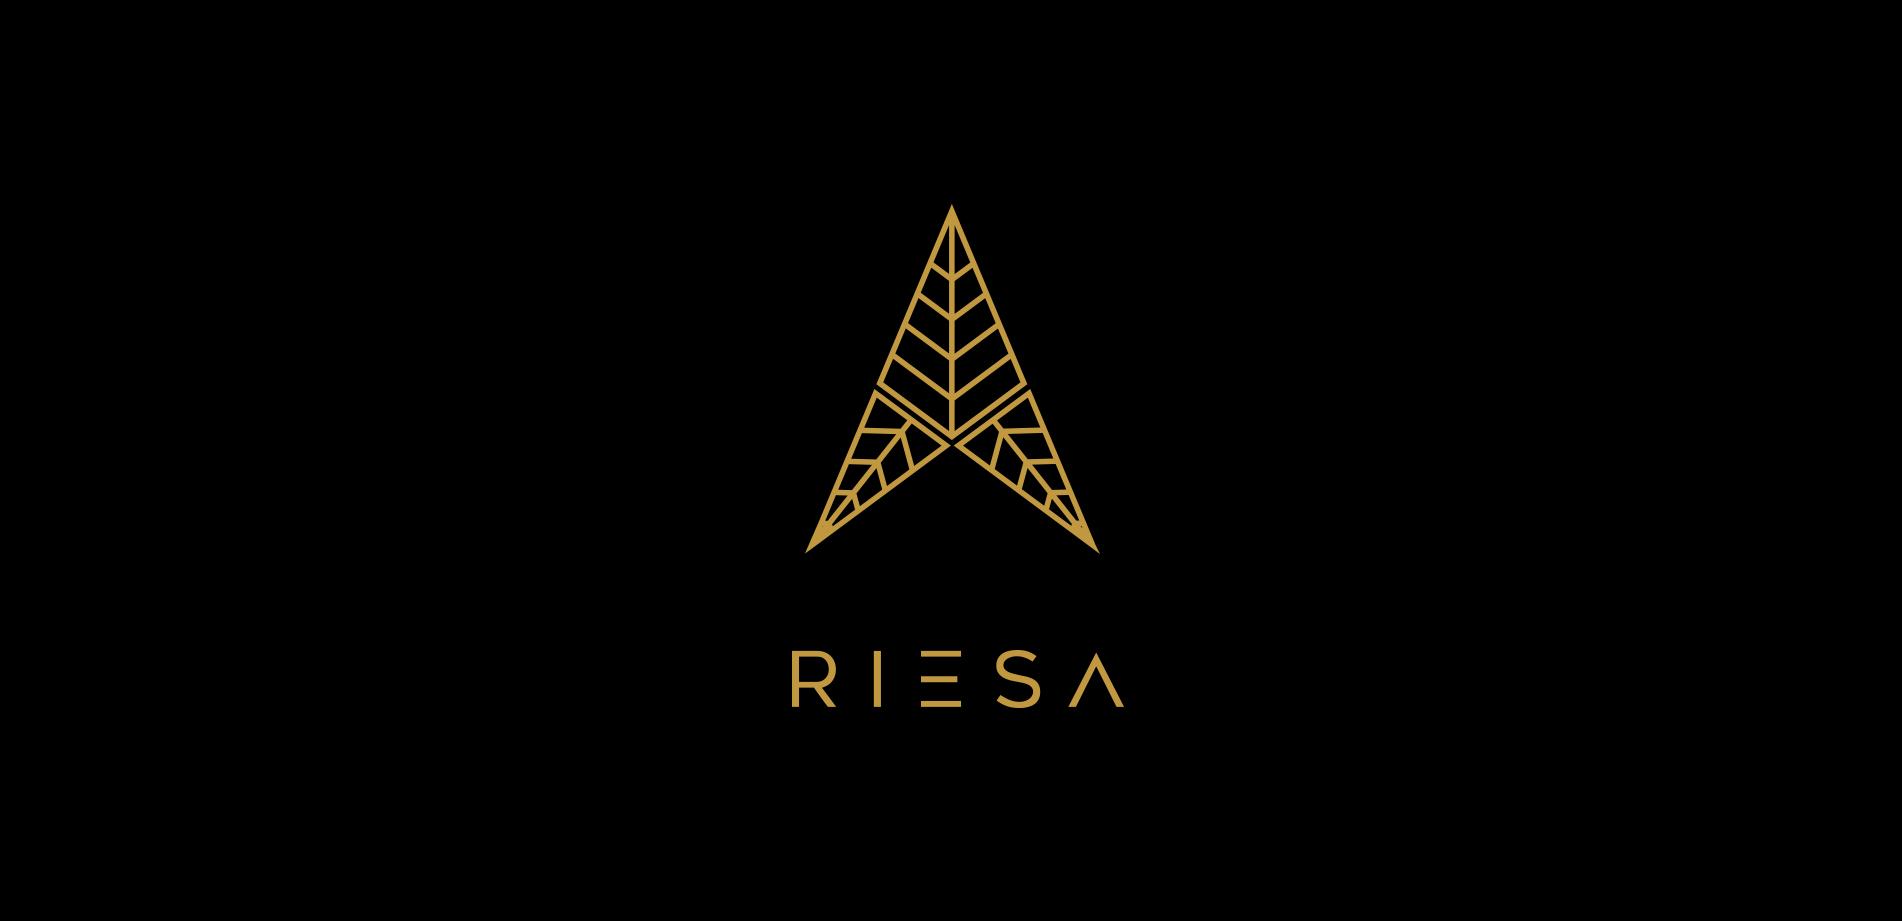 Riesa-Slides-1